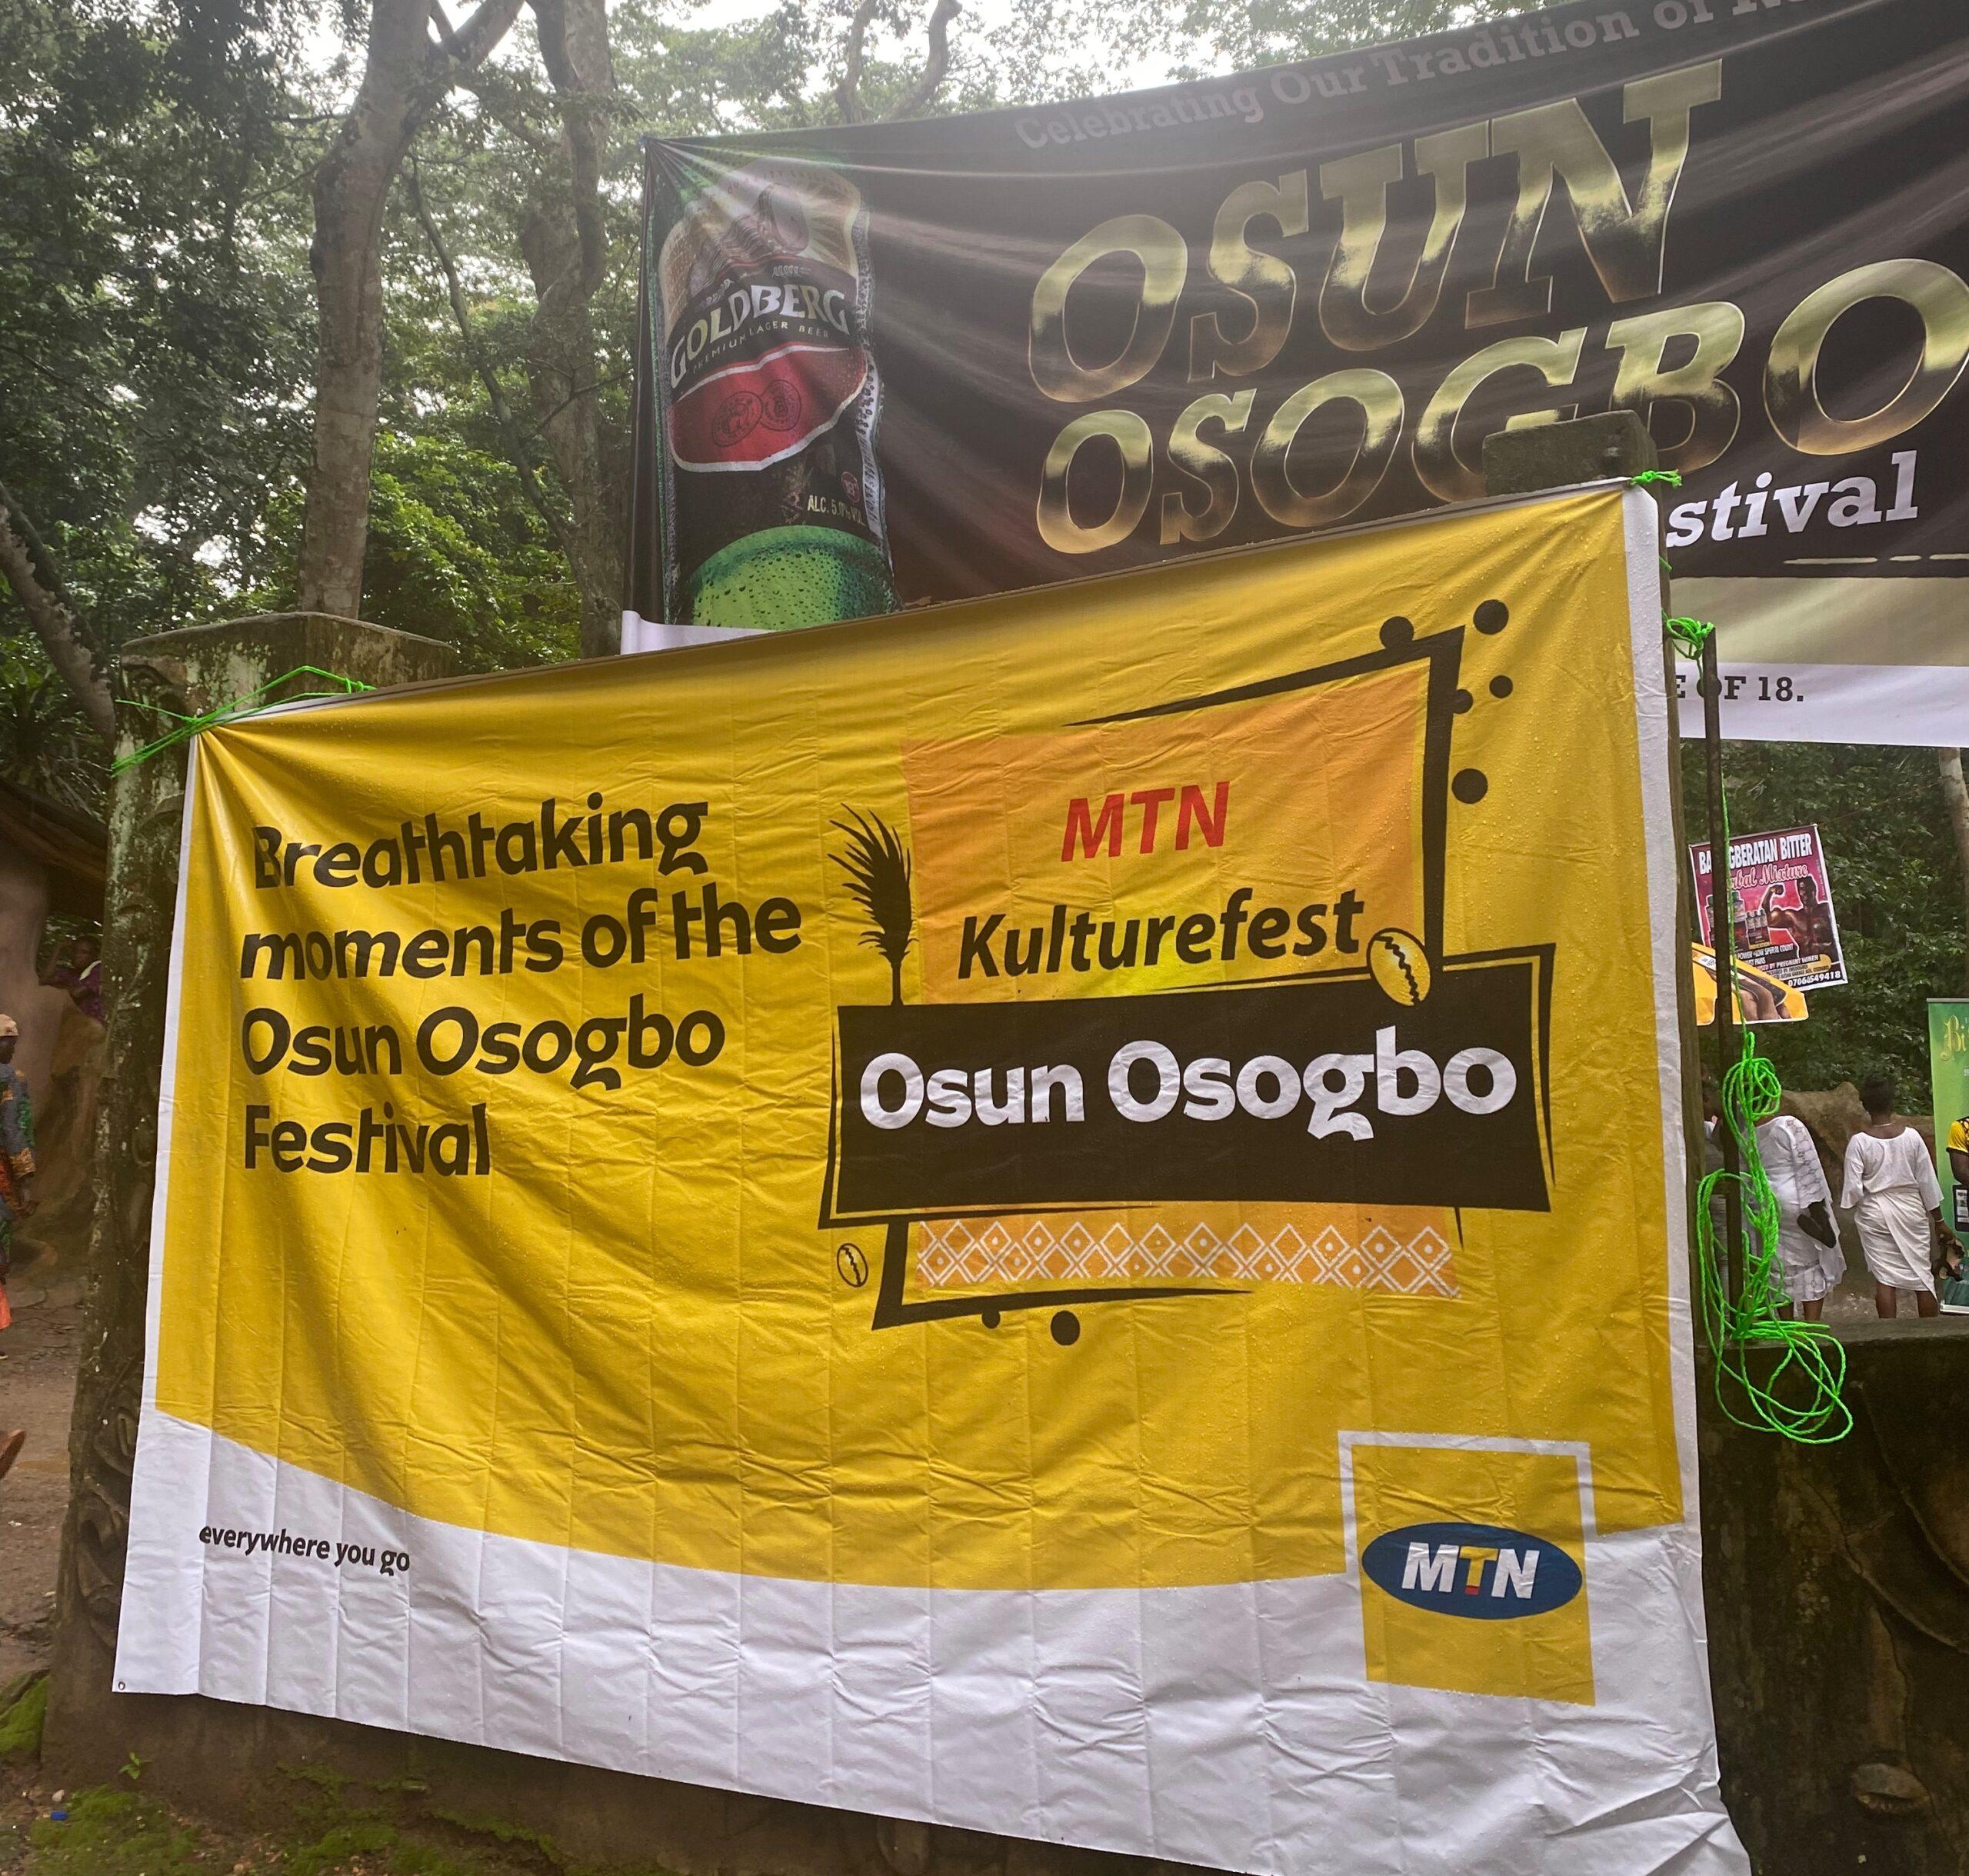 Osun festival: The Osun goddess got pleased